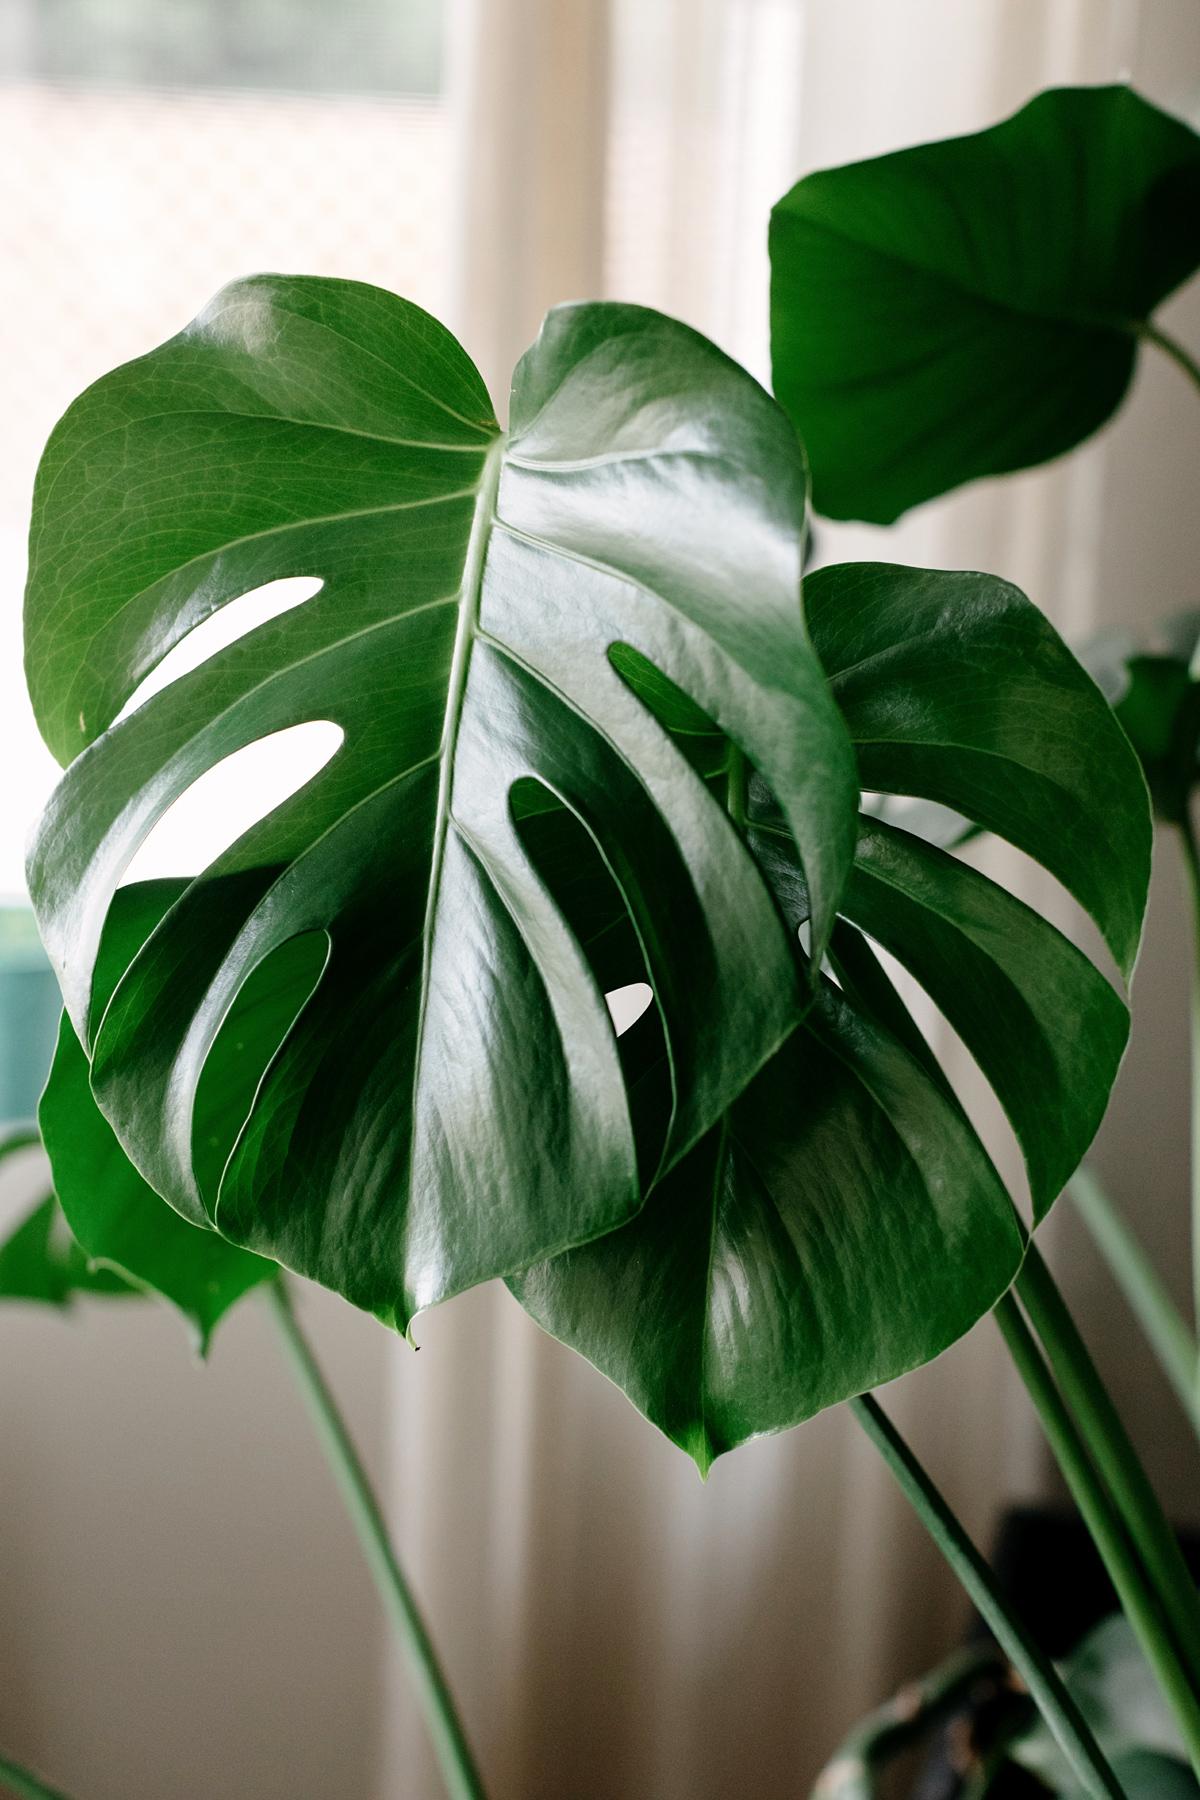 006-plant--plant-addict--blogger--interior-blogger--interio--home-blogger--lifestyle--lifestlye-blogger--tropical--urban-jungle.jpg